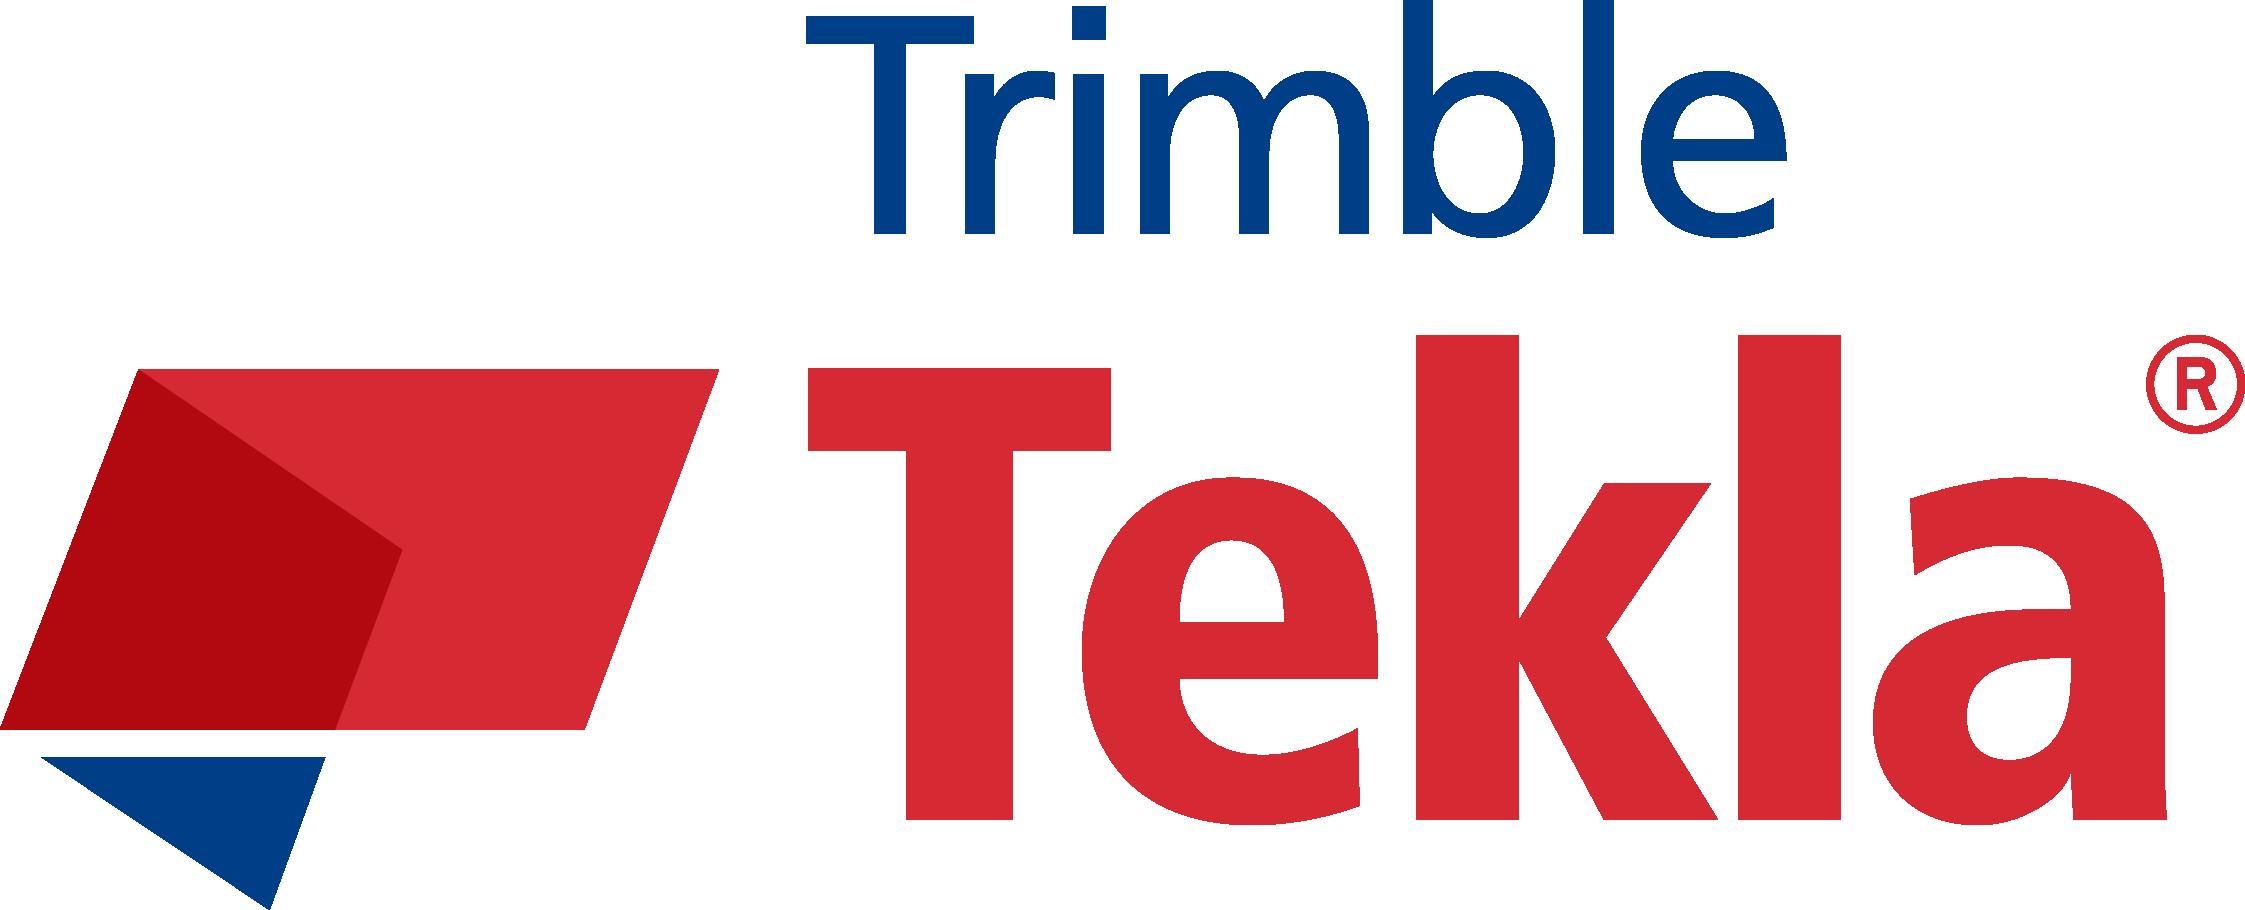 Trimble-Tekla2016-pos-RGB